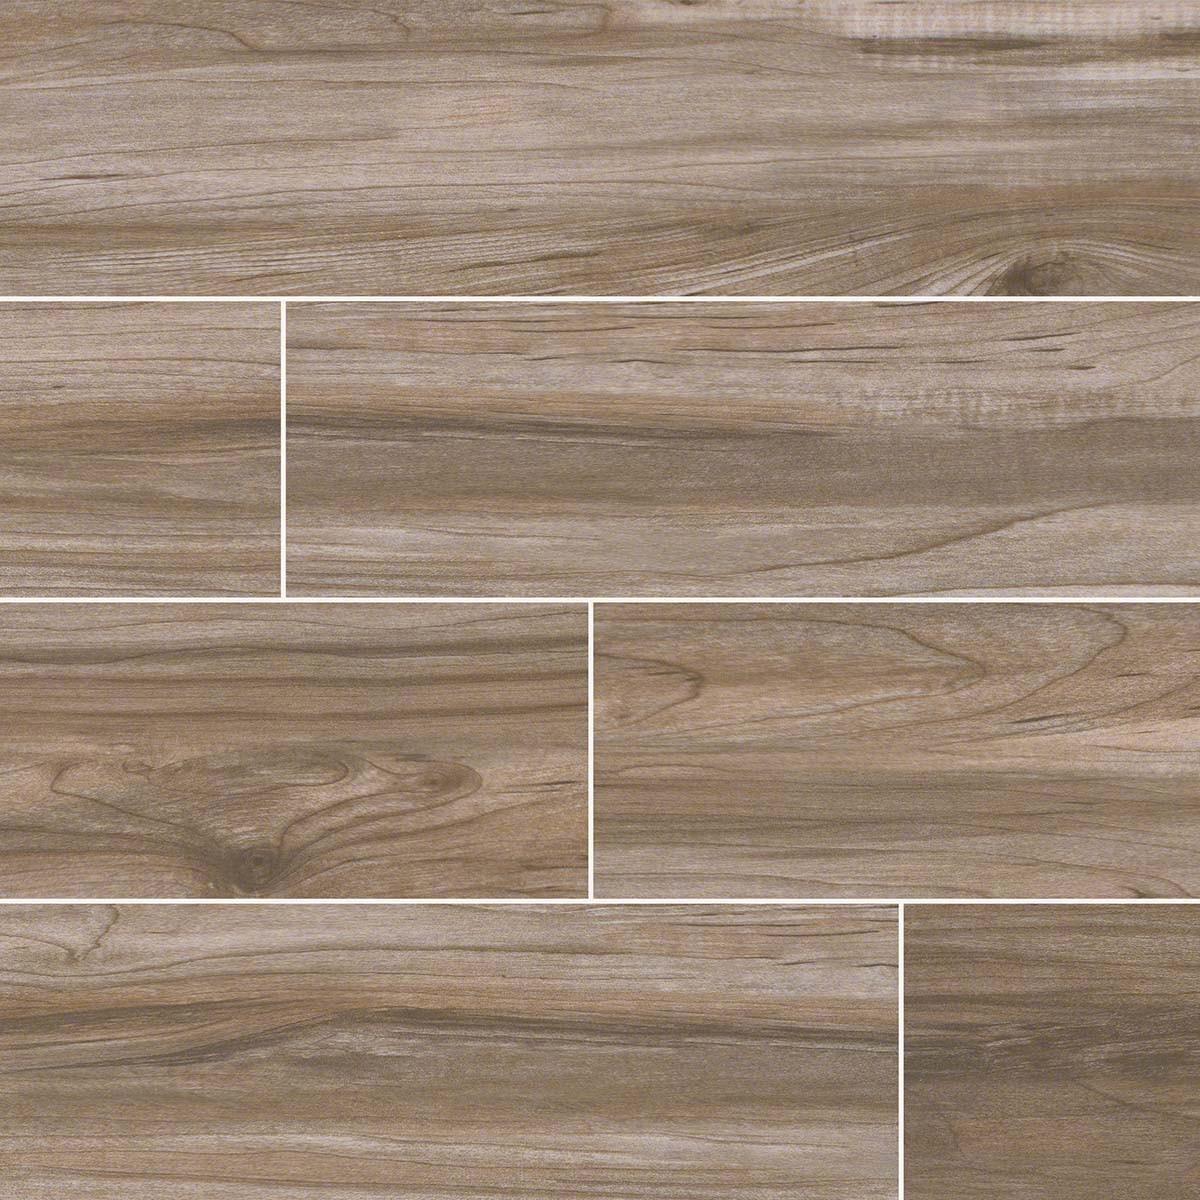 Tile Carolina Timber 6x24 Beige It Looks Like Wood